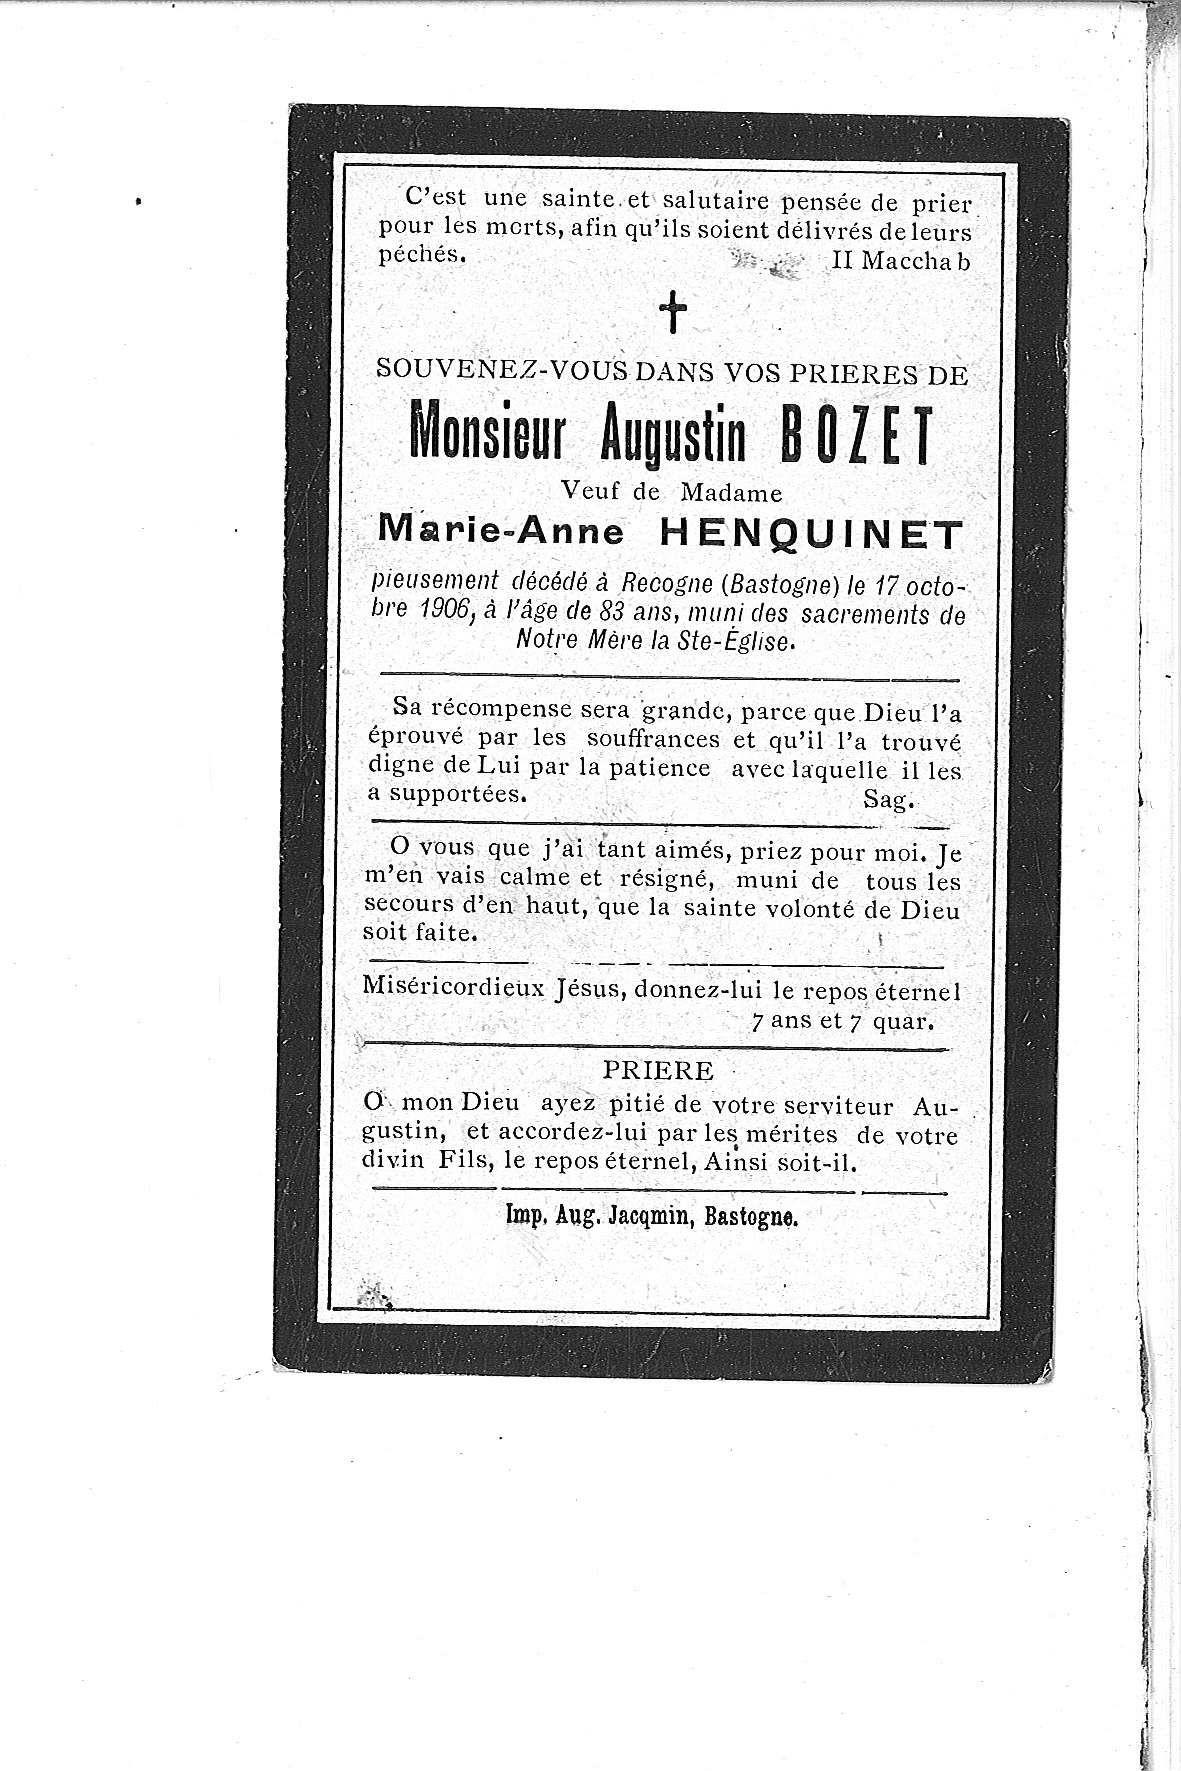 Augustin (1906) 20110713092125_00103.jpg